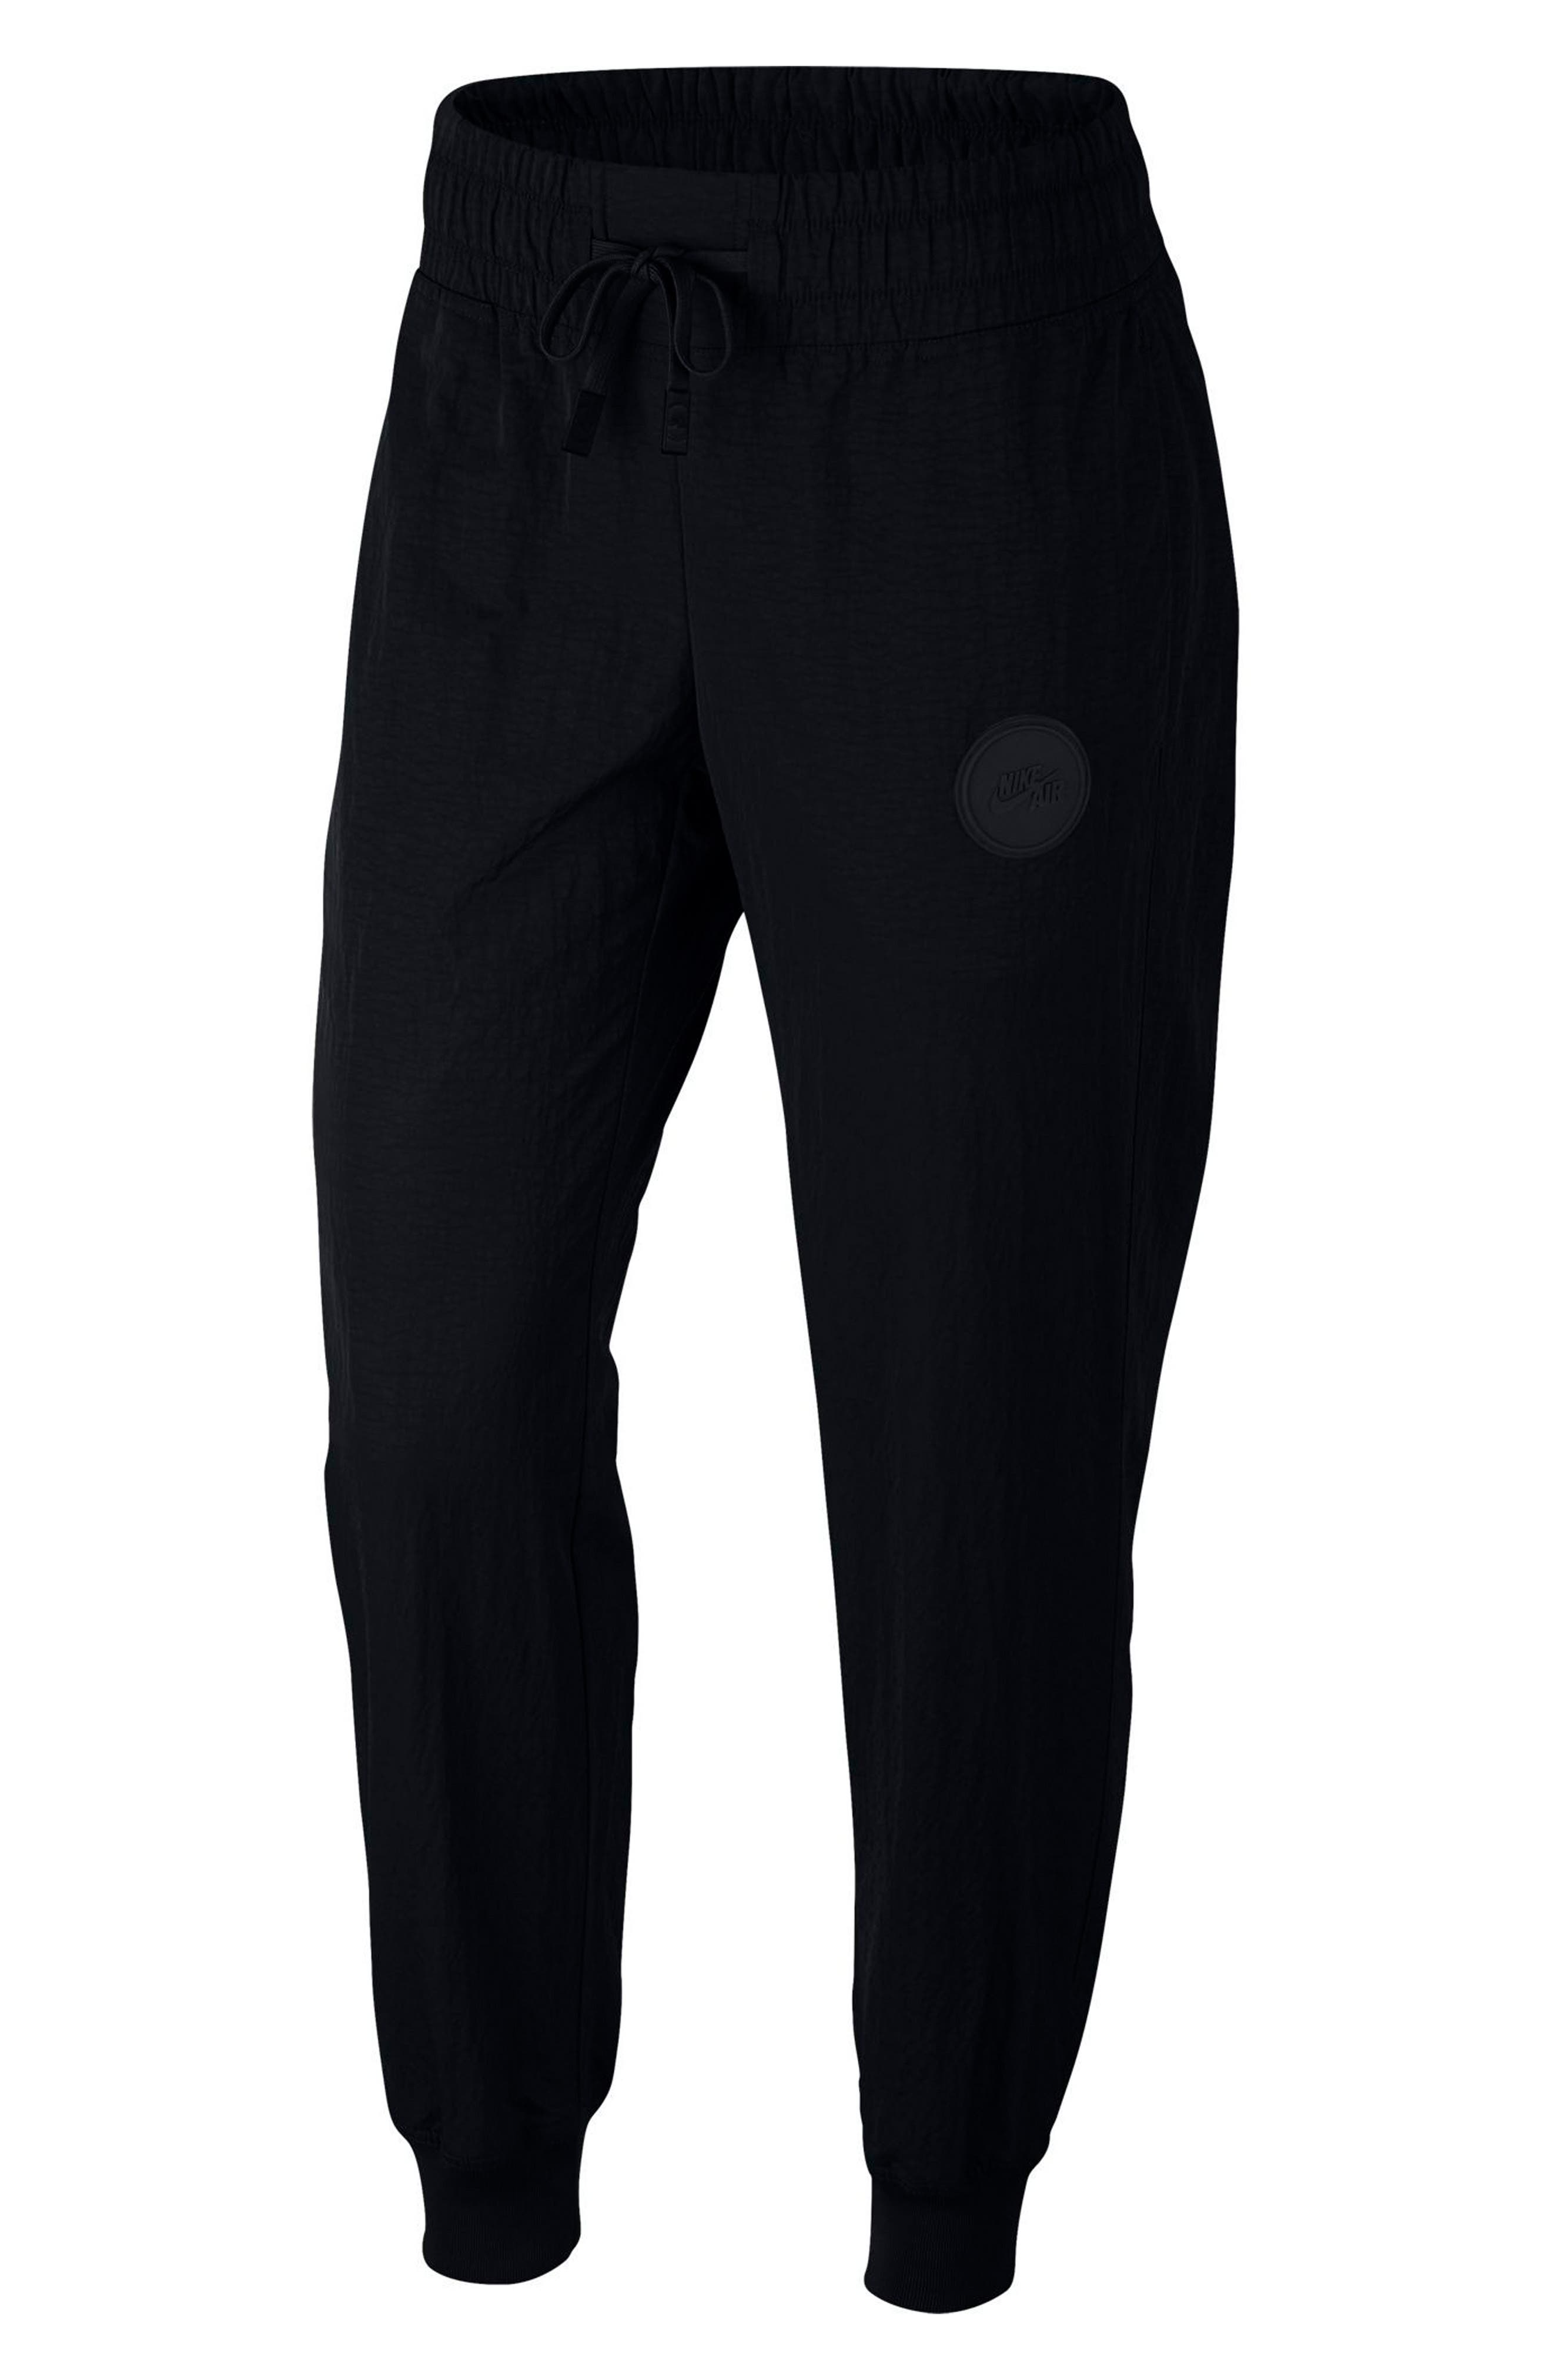 Air Drawstring Sweatpants,                             Alternate thumbnail 4, color,                             010